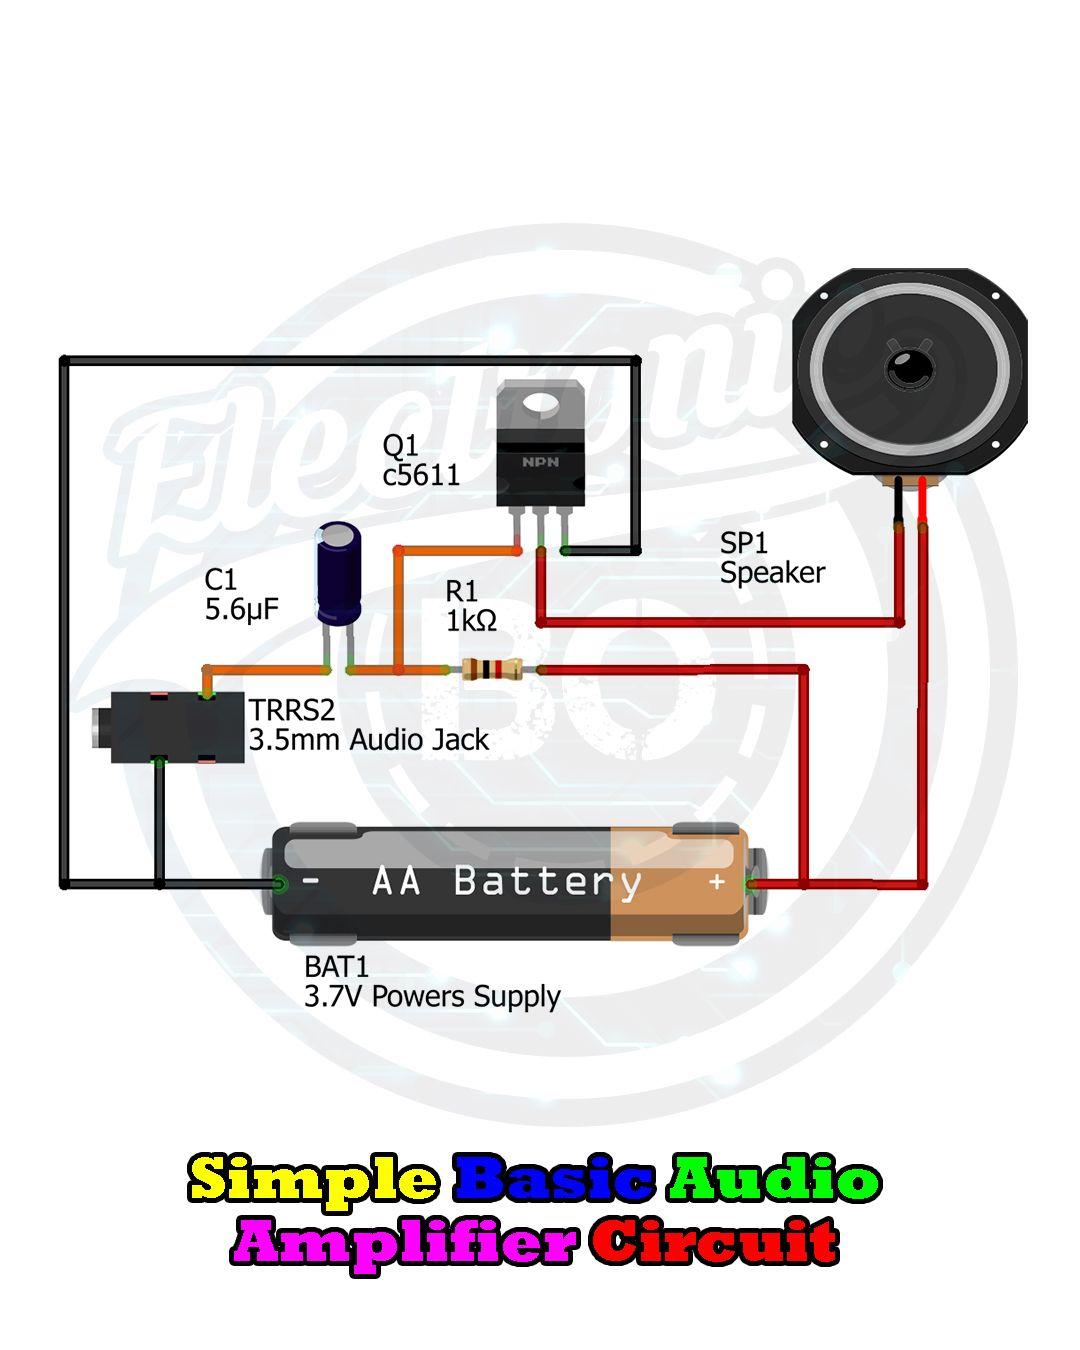 Simple Basic Audio Amplifier Circuit Using Npn Transistor Audio Amplifier Electronic Circuit Projects Electronics Mini Projects